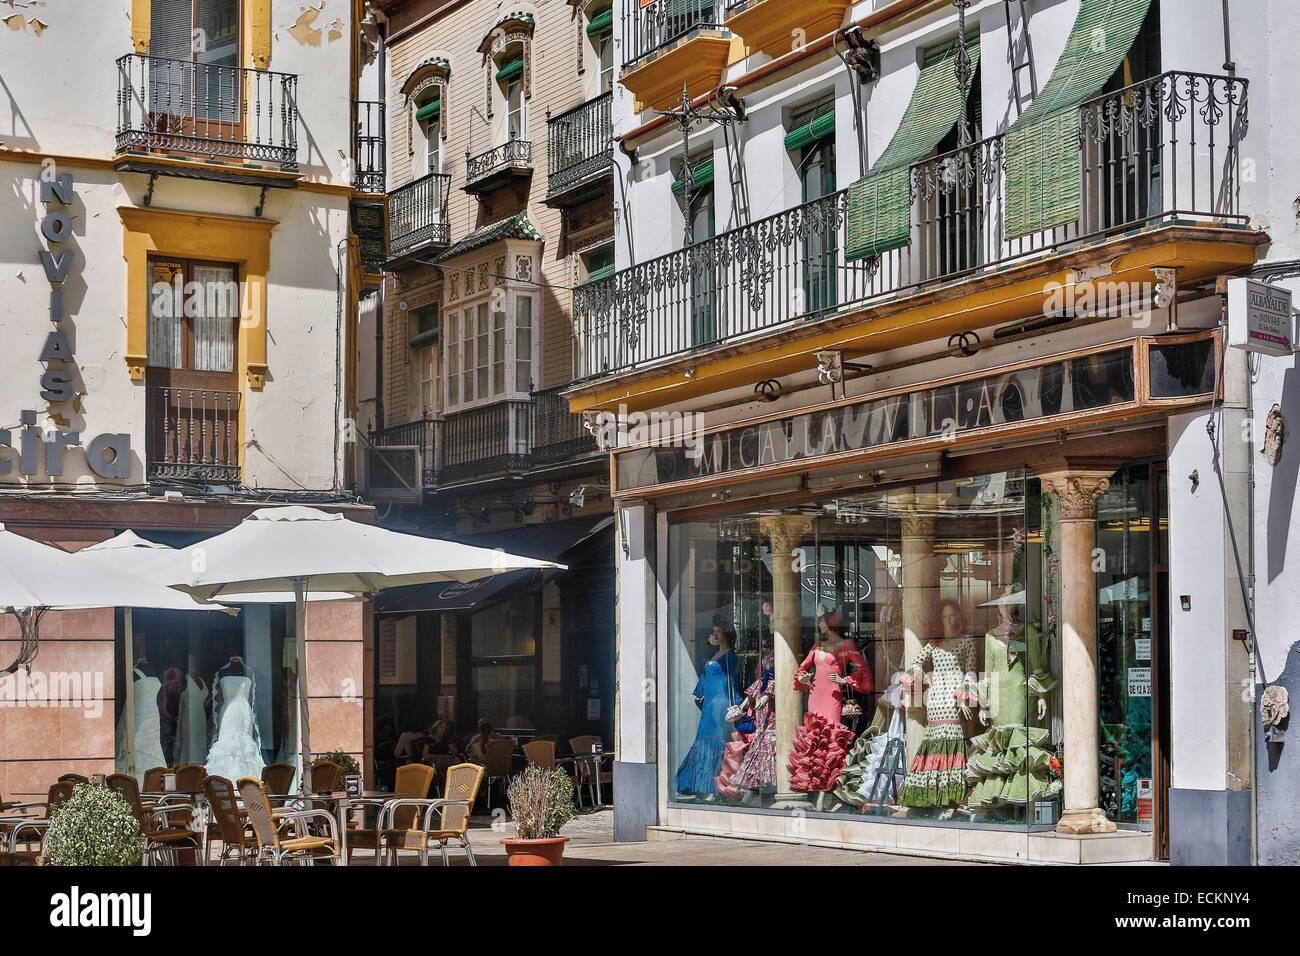 Spanien, Andalusien, Sevilla, El Salvador-Platz, Terrasse des cafΘ ...